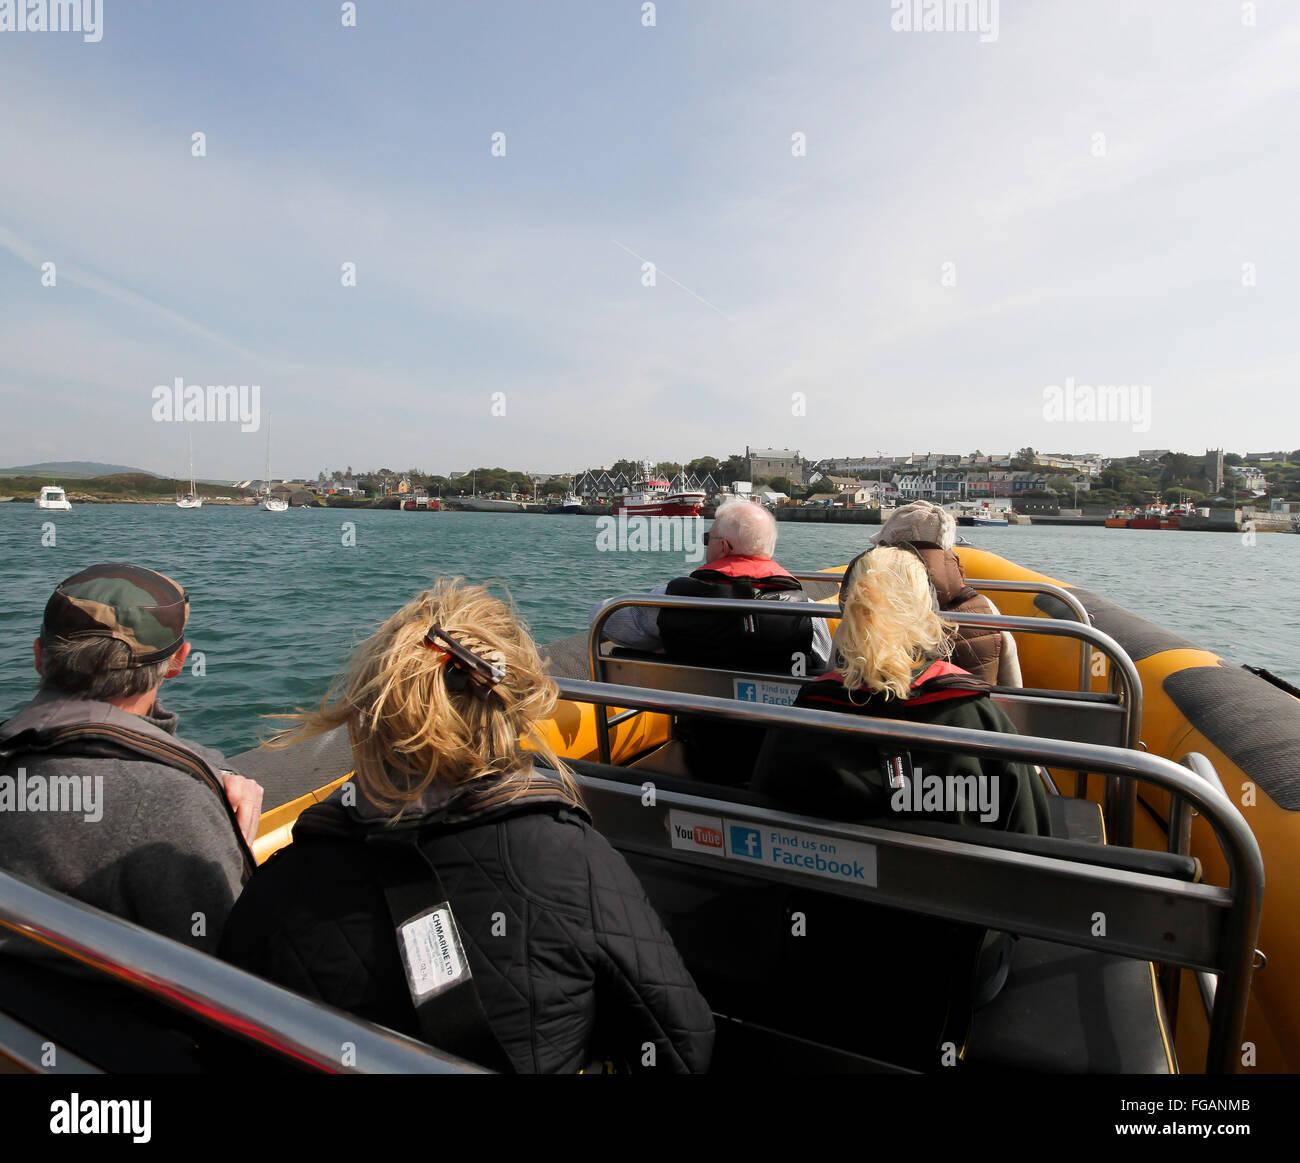 The Baltimore Sea Safari RIB, Seafari 1, coming back from a trip to Baltimore County Cork Ireland - Stock Image